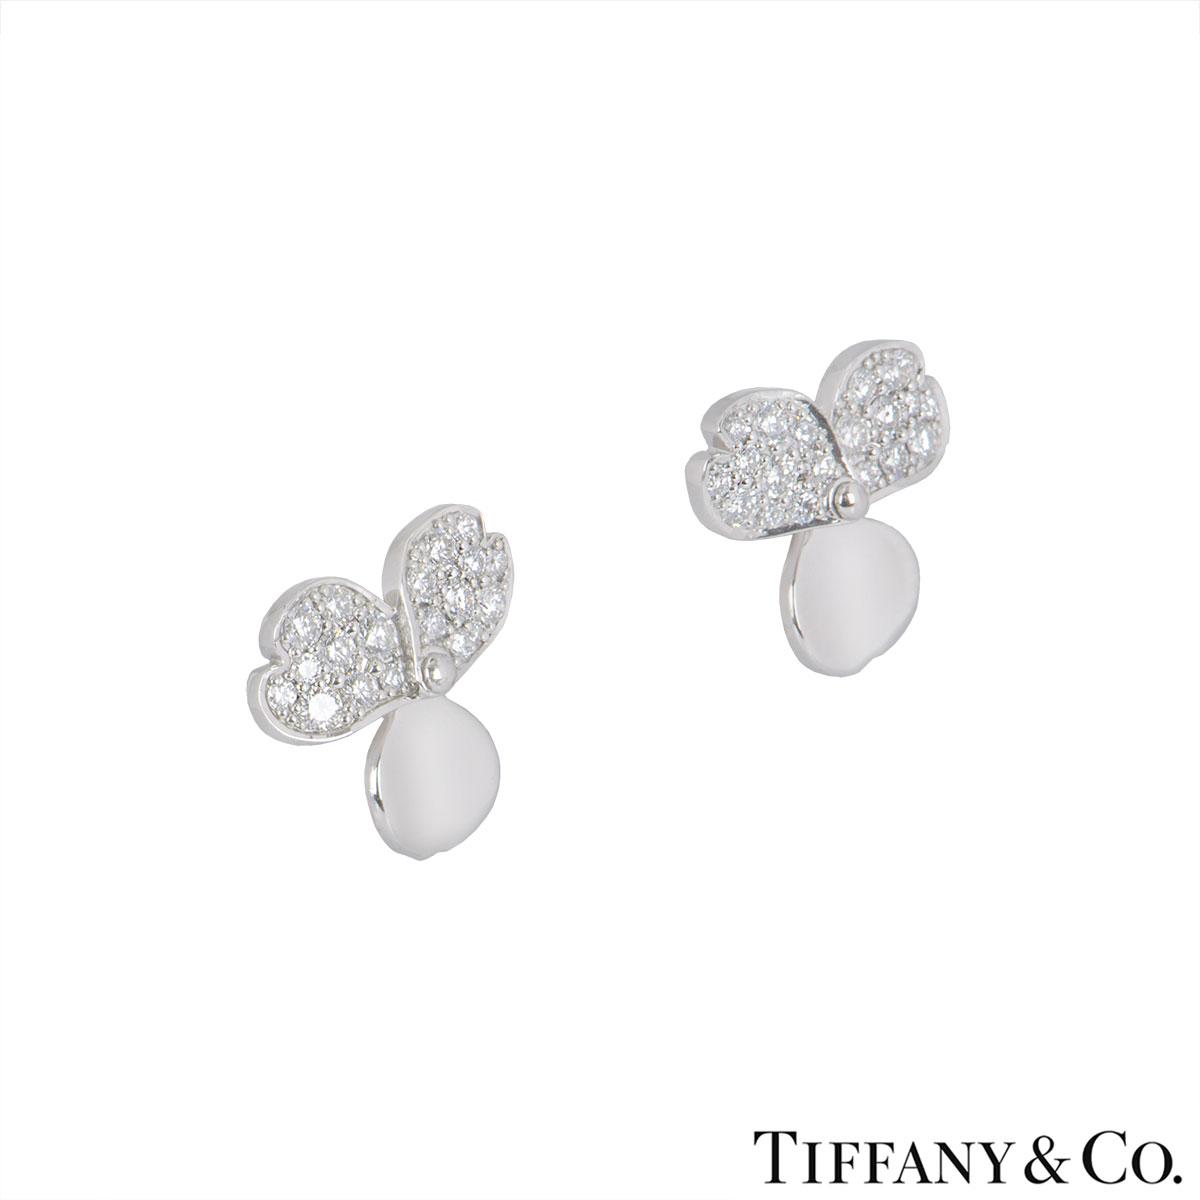 Tiffany & Co. Platinum Diamond Paper Flowers Earrings